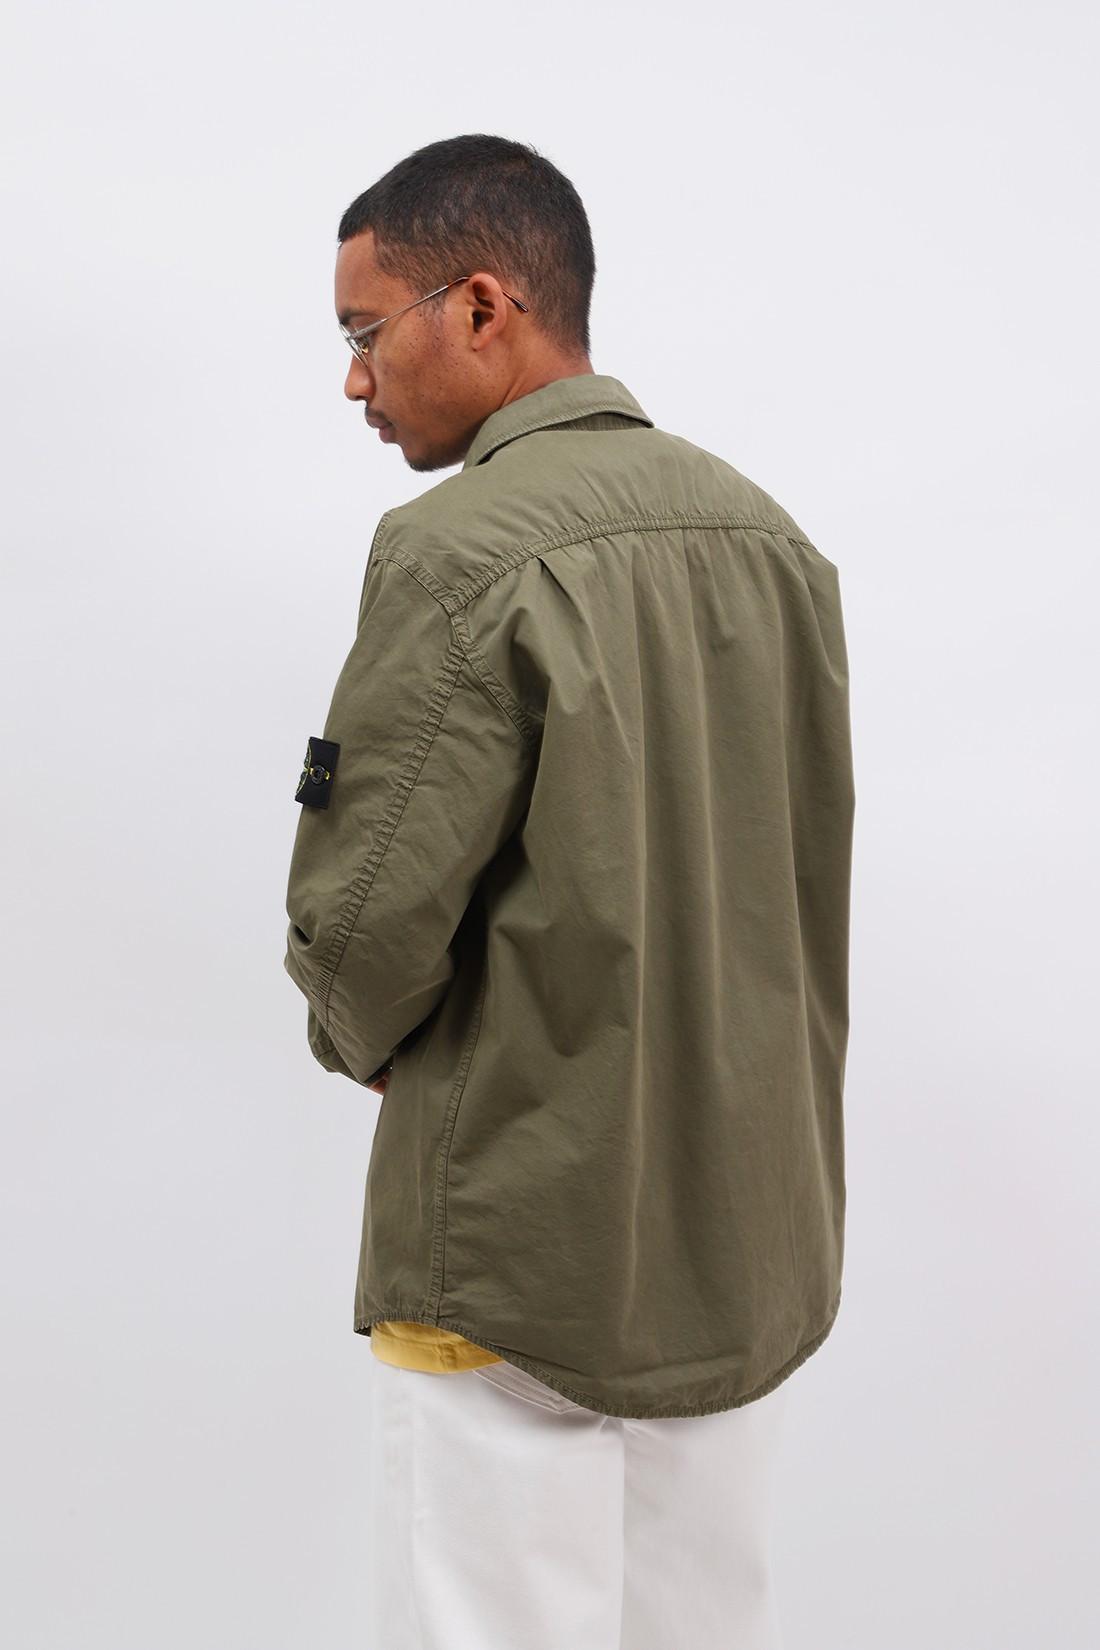 STONE ISLAND / 110wn overshirt v0158 Verde oliva